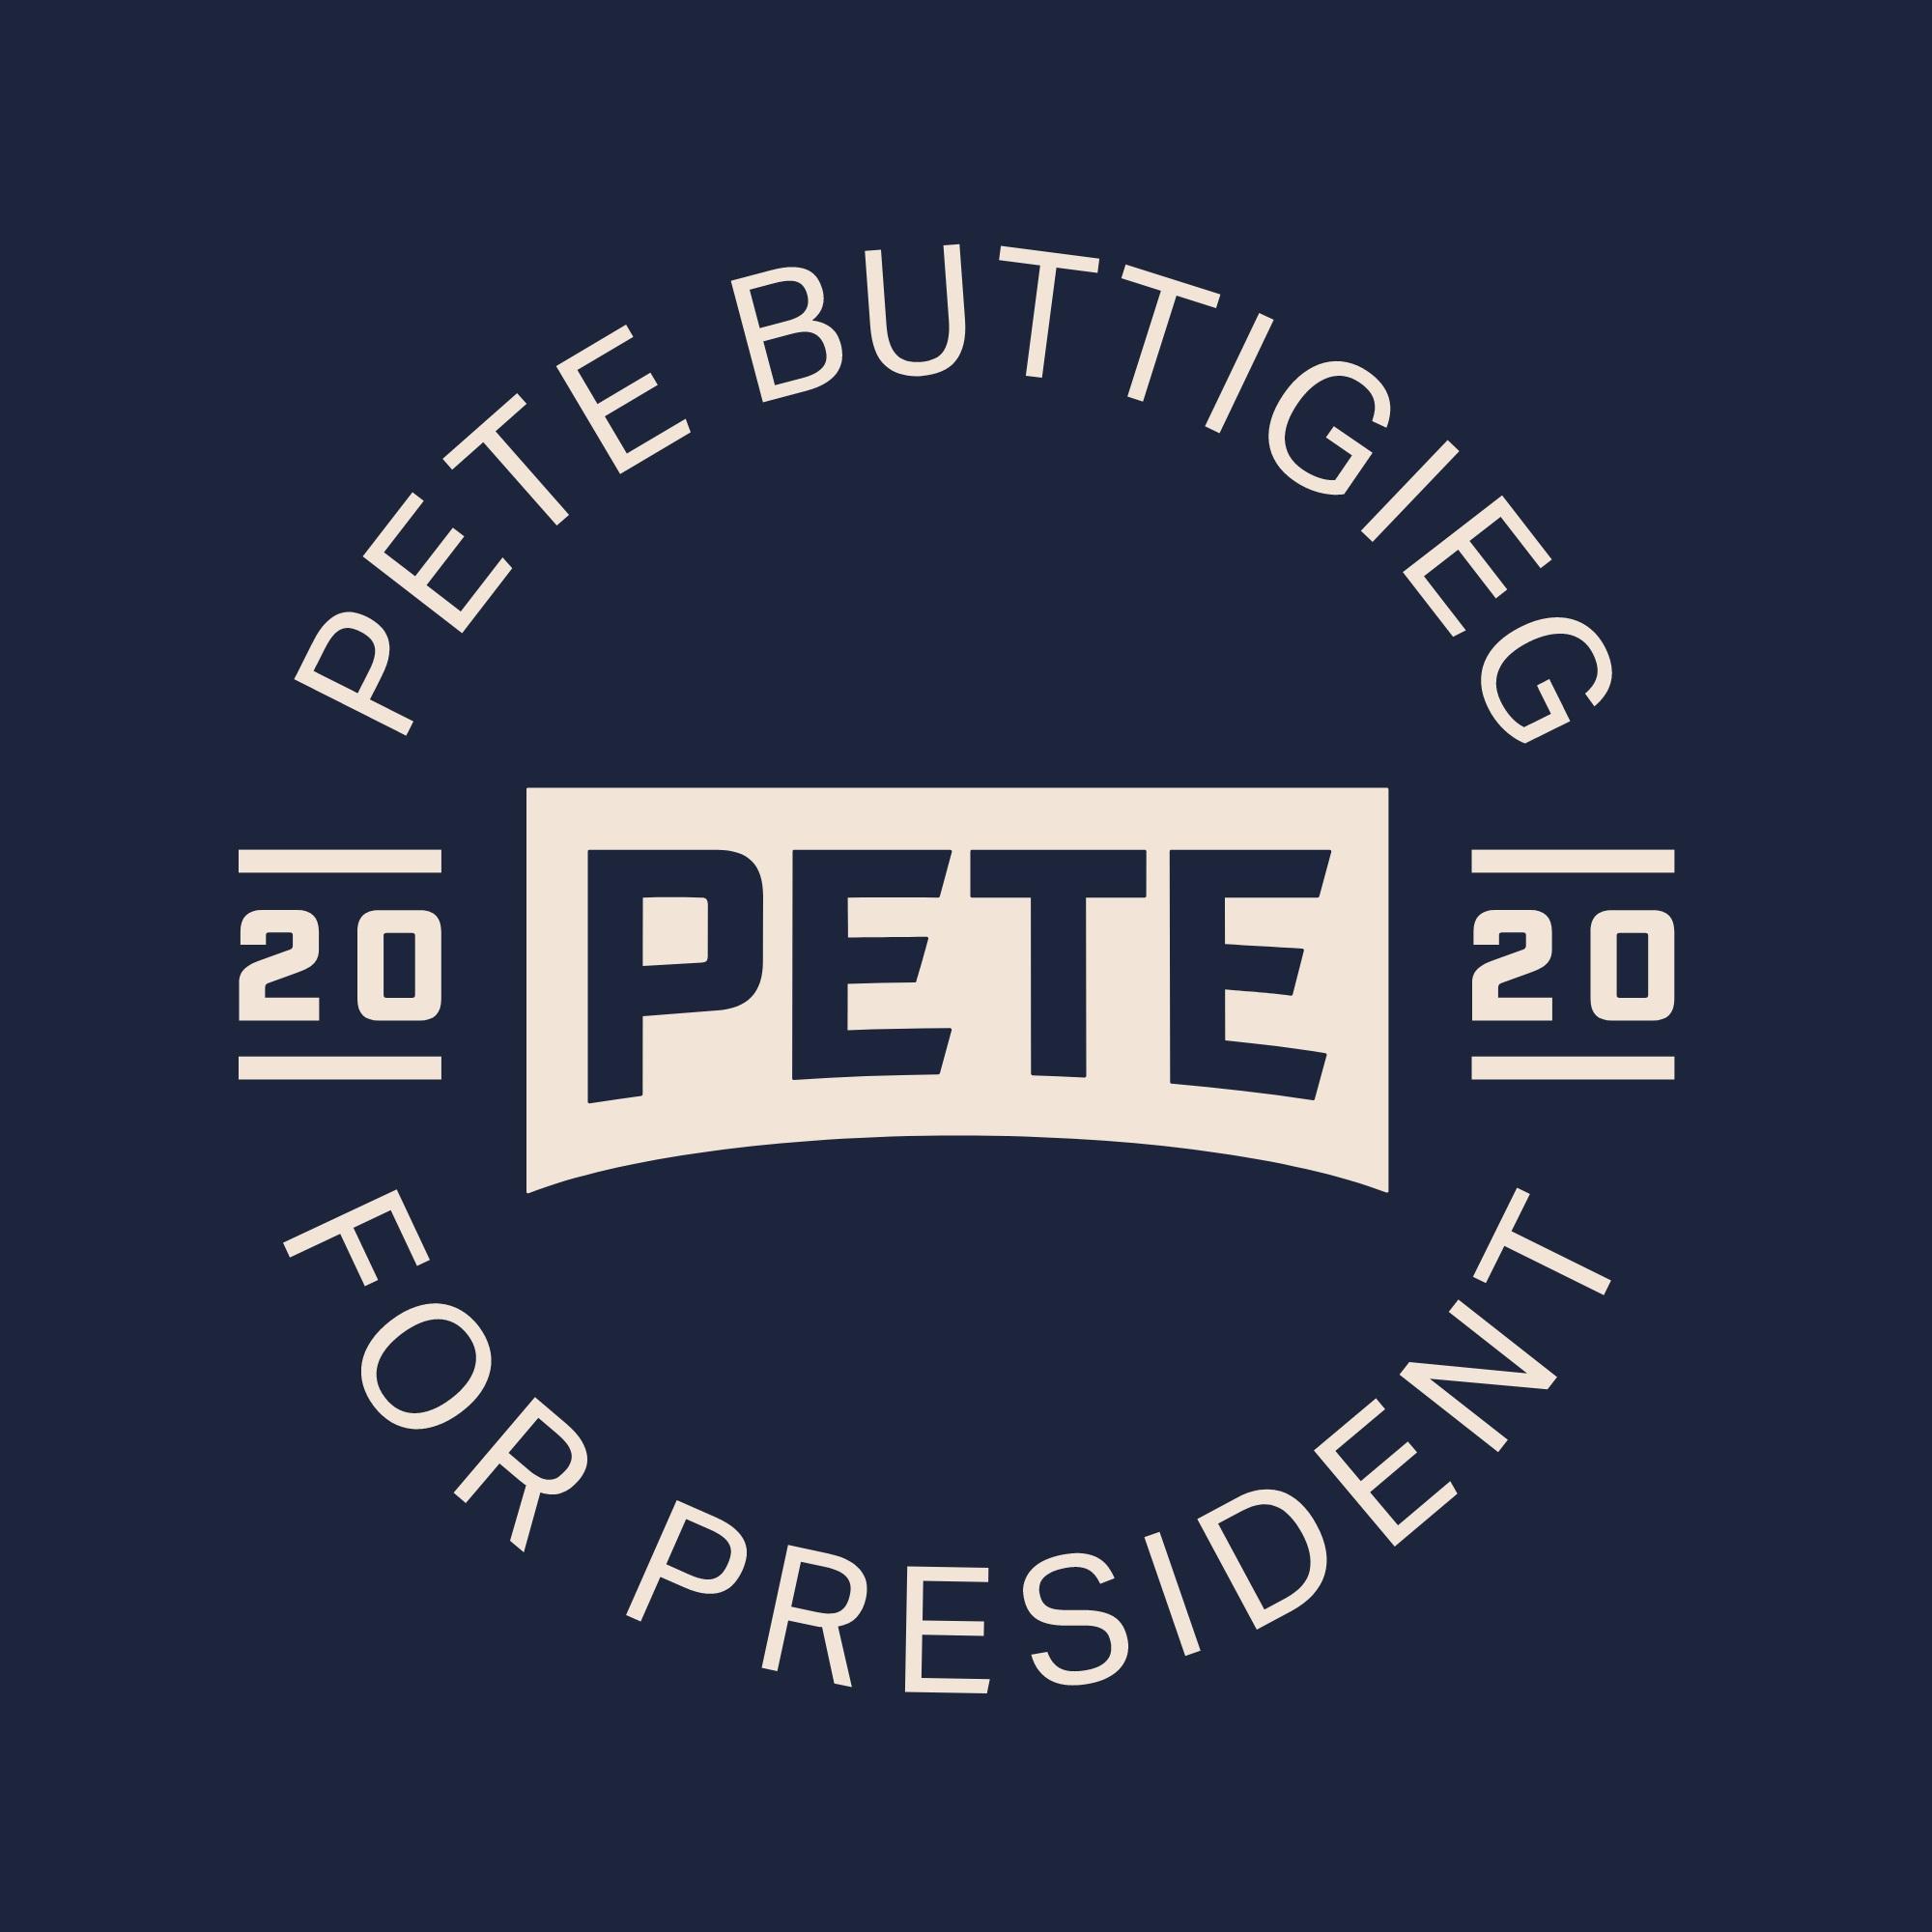 Pete+Buttigieg+for+President+%281%29.jpg